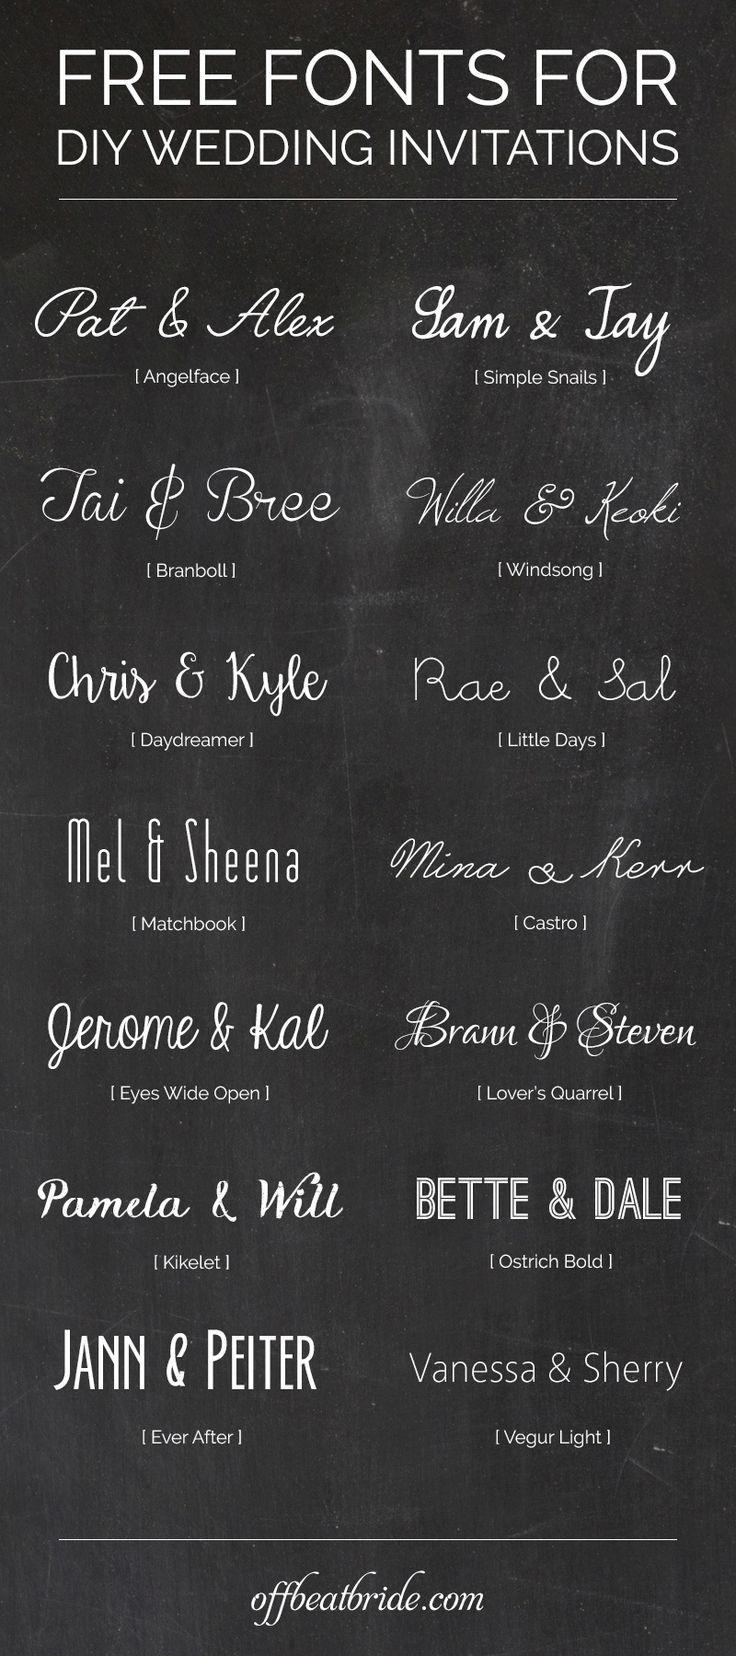 Free wedding invitation fonts for DIY invitations from @offbeatbride